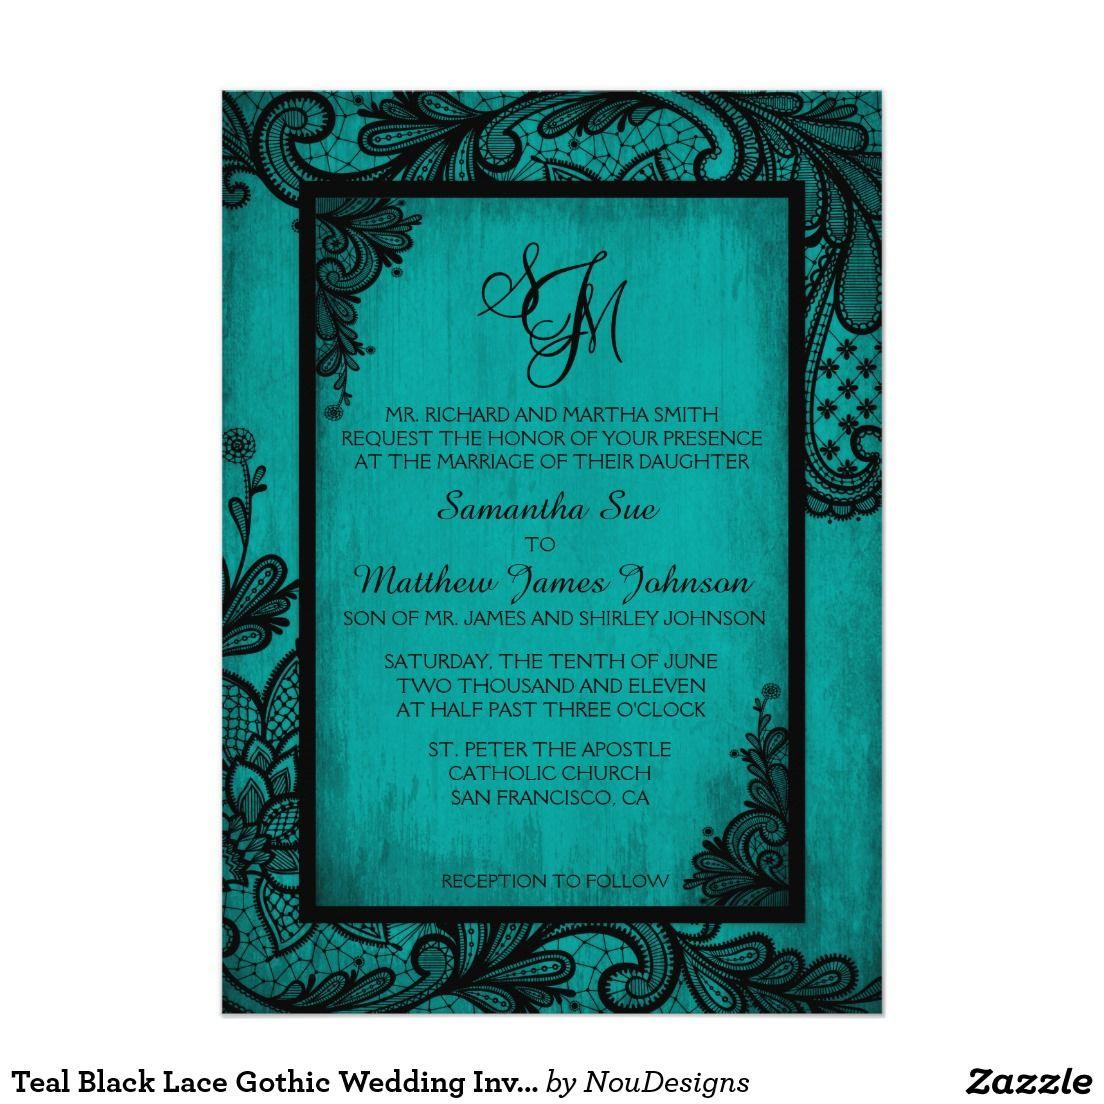 Teal black lace gothic wedding invitation card lace wedding teal black lace gothic wedding invitation card stopboris Images